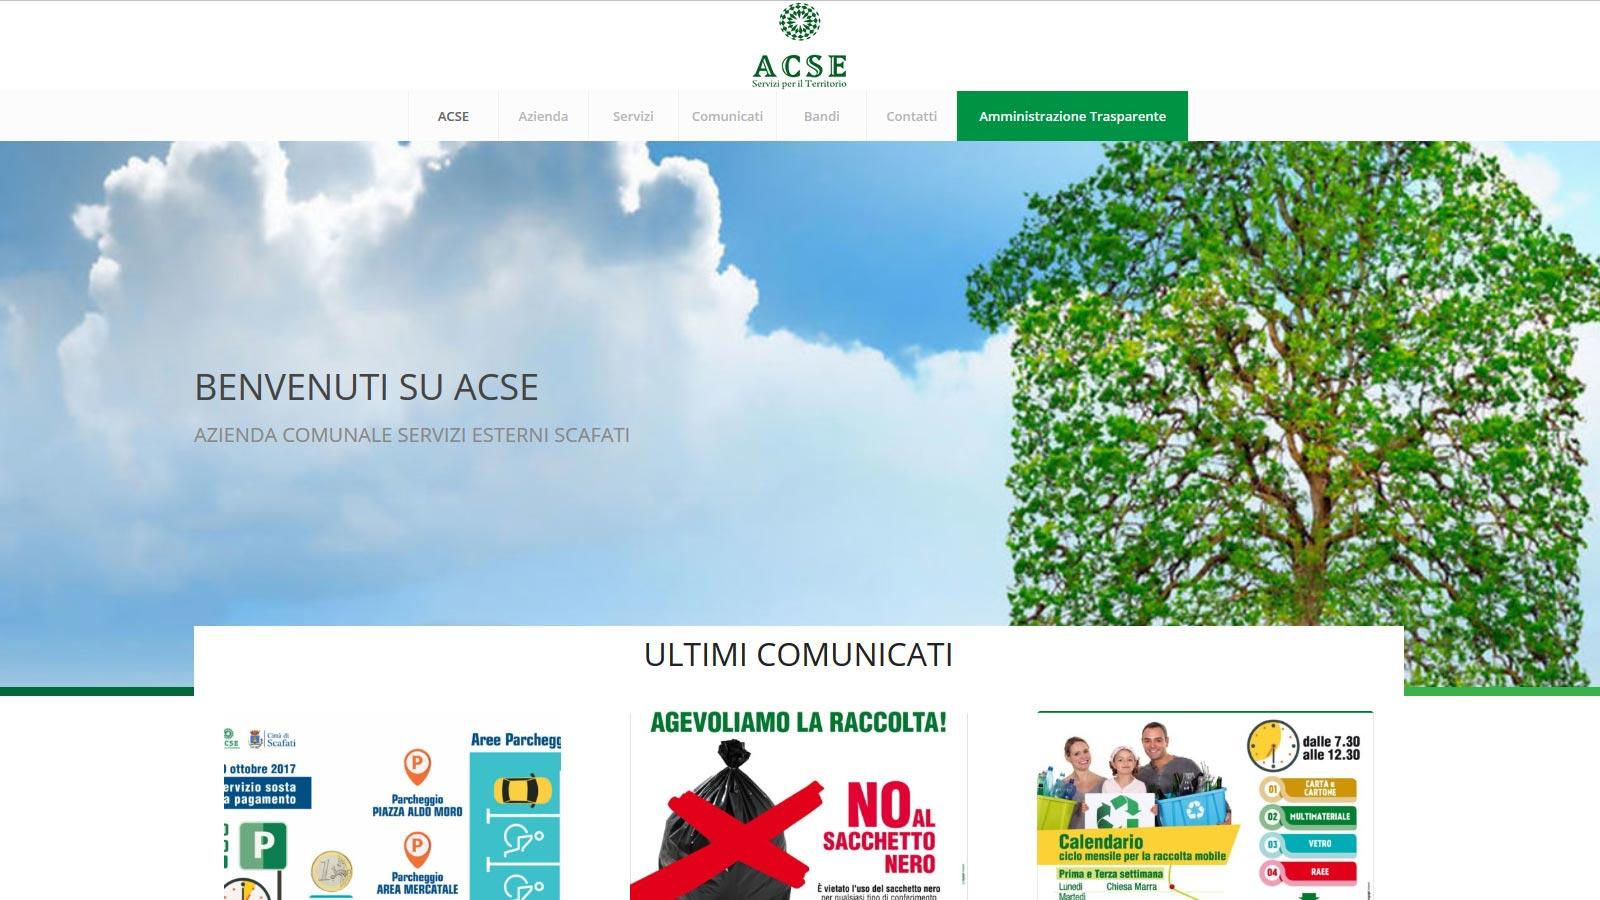 www.acsespa.it